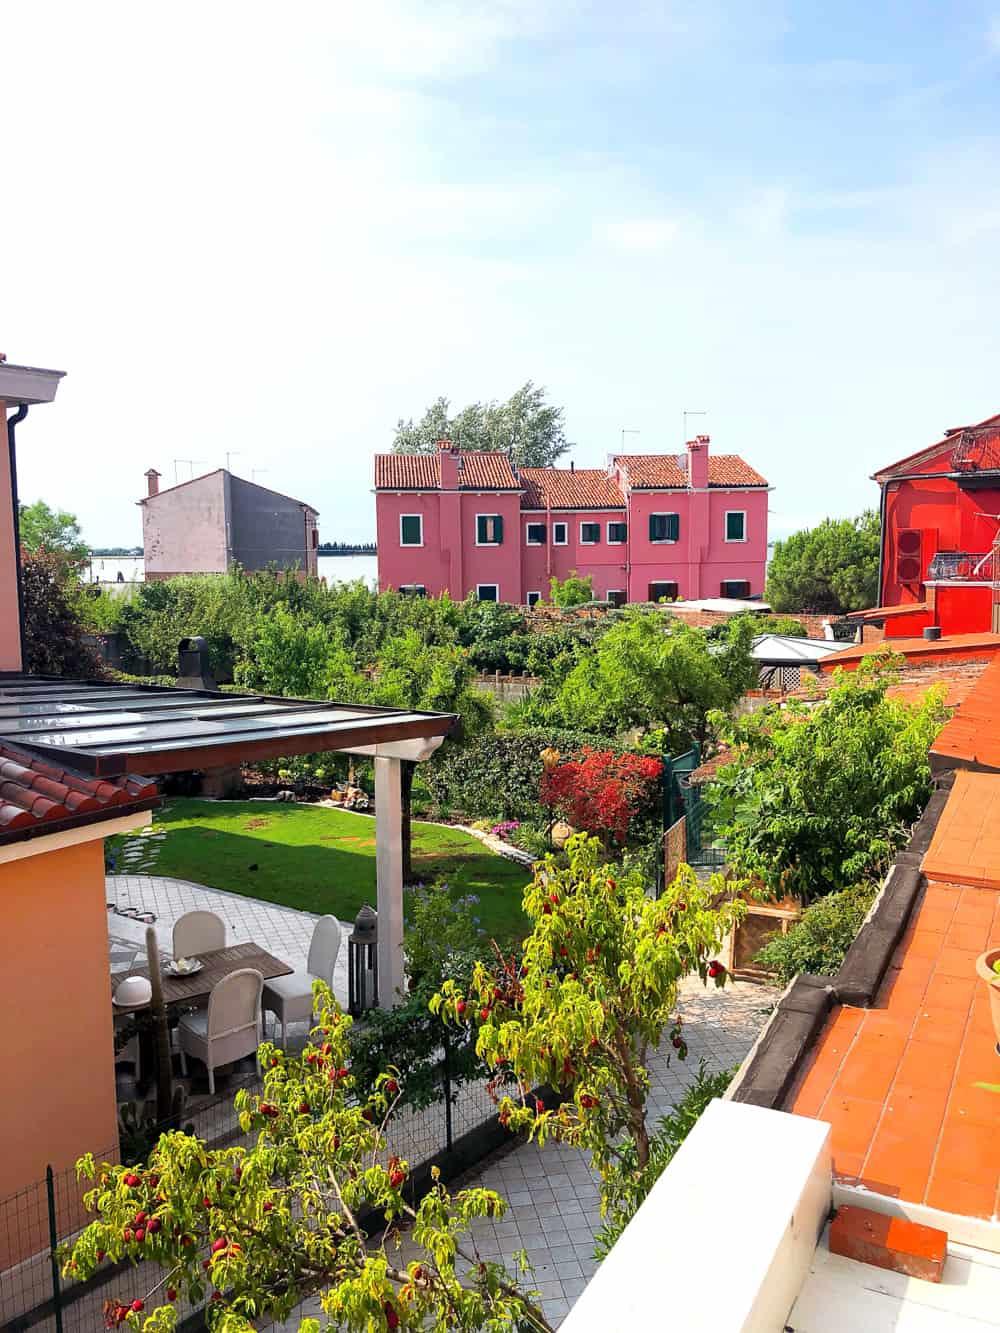 EMILY'S CLASSY ITALIAN HEN PARTY IN BURANO, VENICE | Bespoke